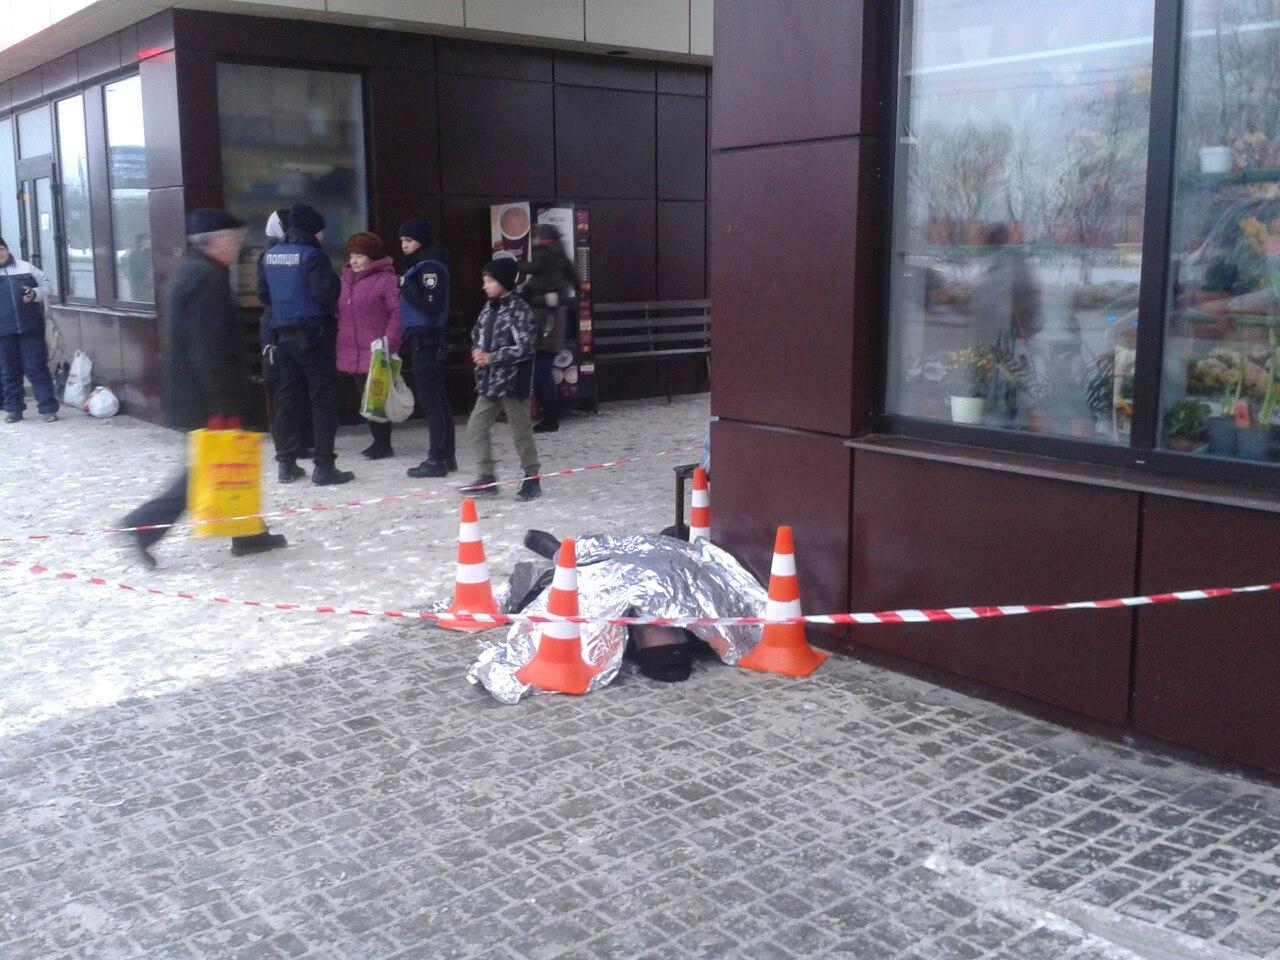 Новогодний сюрприз для шефа: в Запорожье после корпоратива зверски убили руководителя